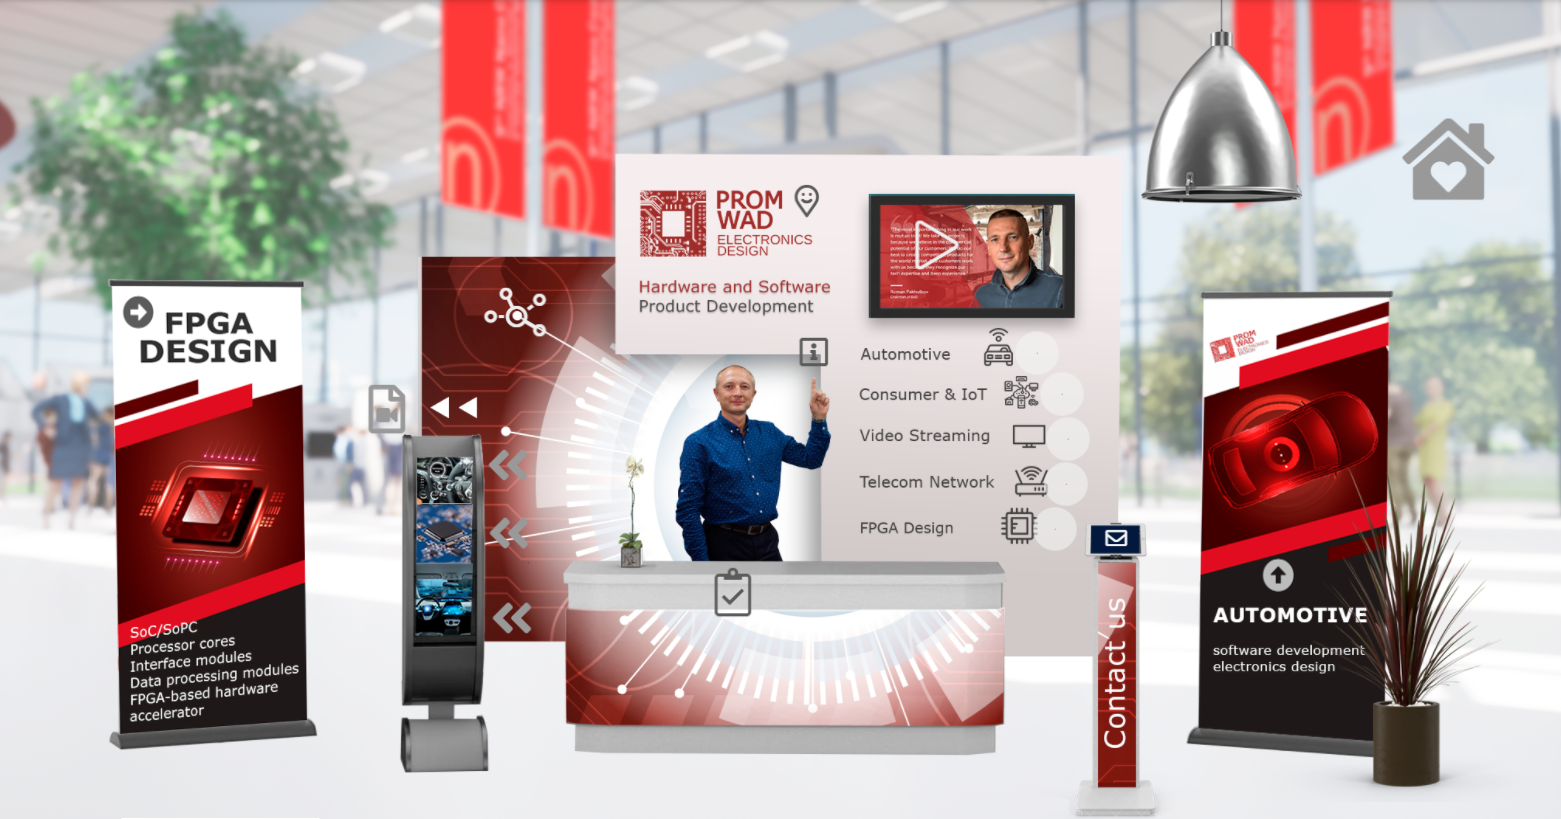 Promwad Virtual Booth NRW Nano